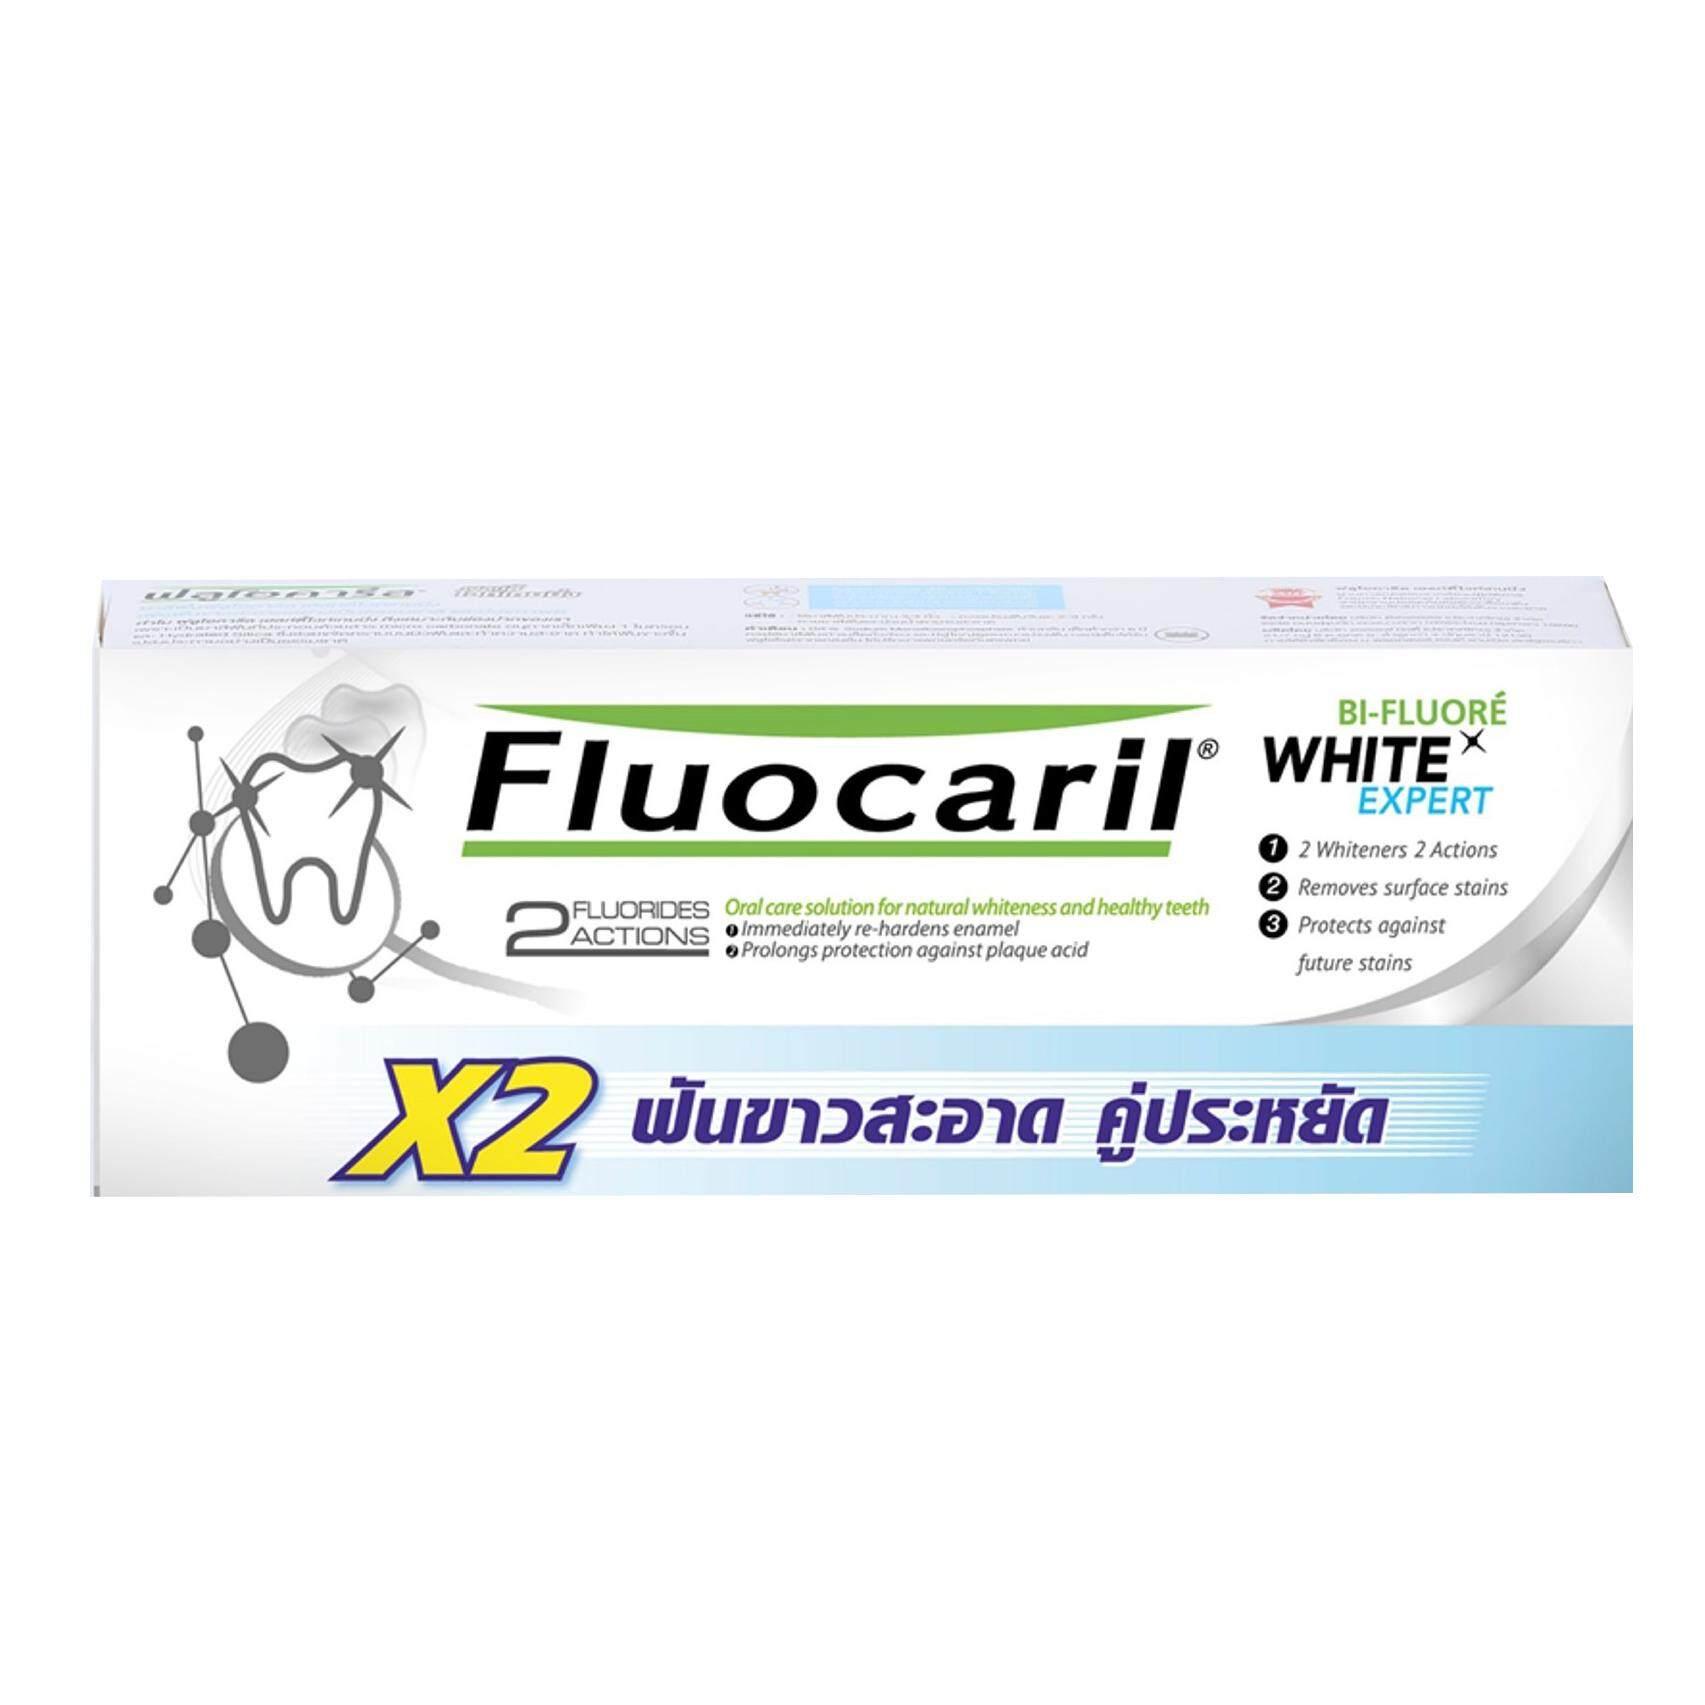 Fluocaril ยาฟลูโอคารีล ไวท์เอ็กซ์เพริ์ธ 160 กรัม แพ็คคู่ (Oral,Oral Care,Toothpaste,ยาสีฟัน,ดูแลฟัน,ช่องปาก,สุขภาพฟัน) ของแท้